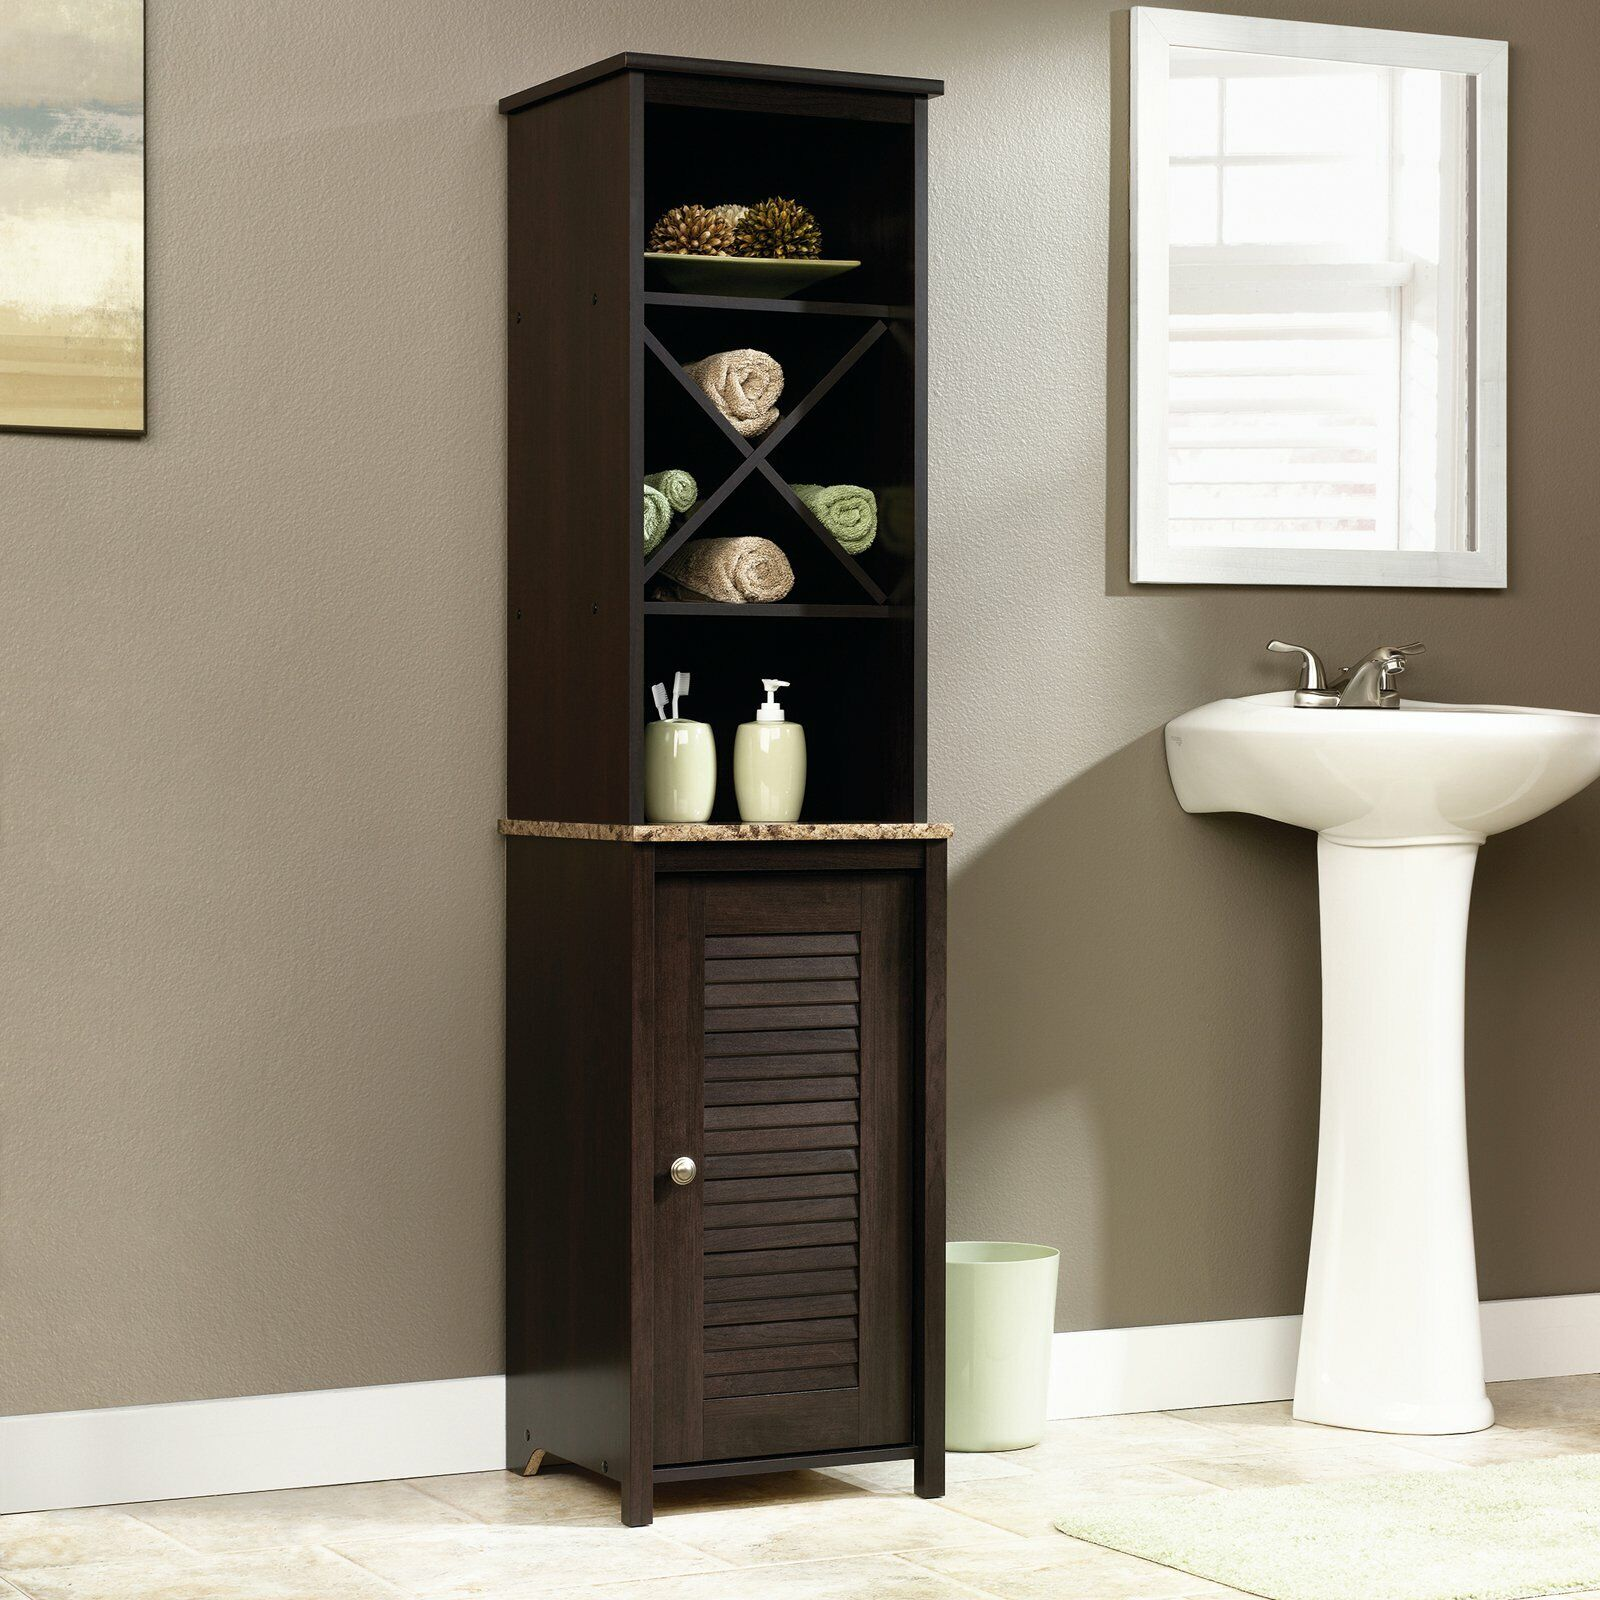 cherry finish linen tower bathroom towel storage cabinet tall dark wooden narrow | ebay